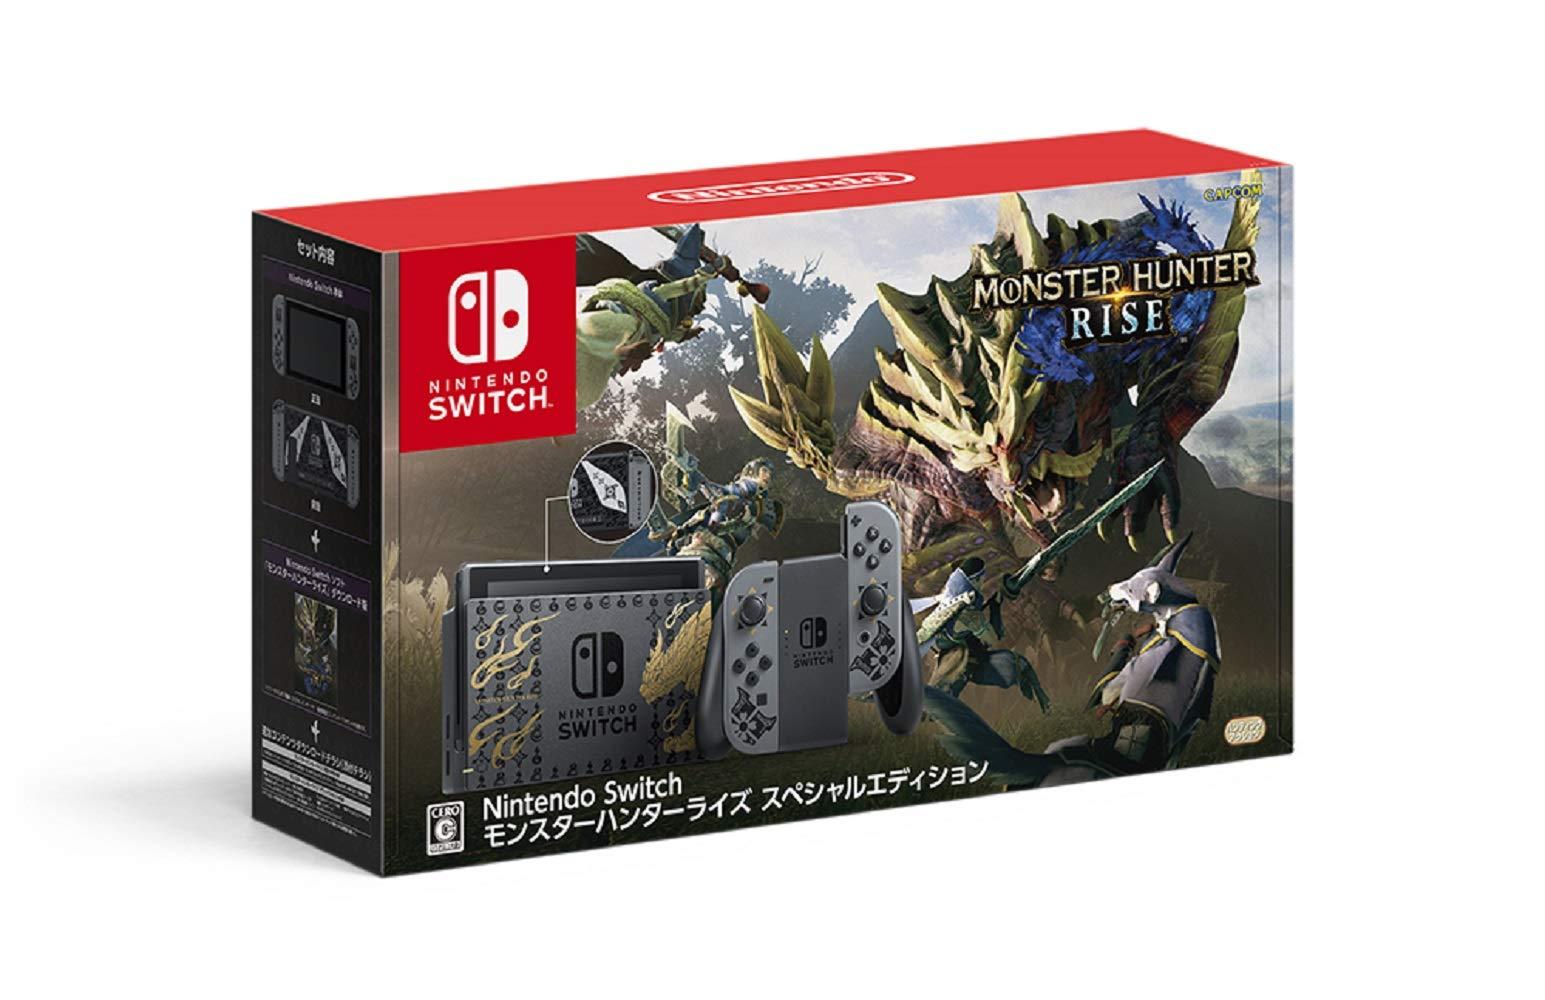 『Nintendo Switch モンスターハンターライズ スペシャルエディション』の抽選販売【ゲオ】